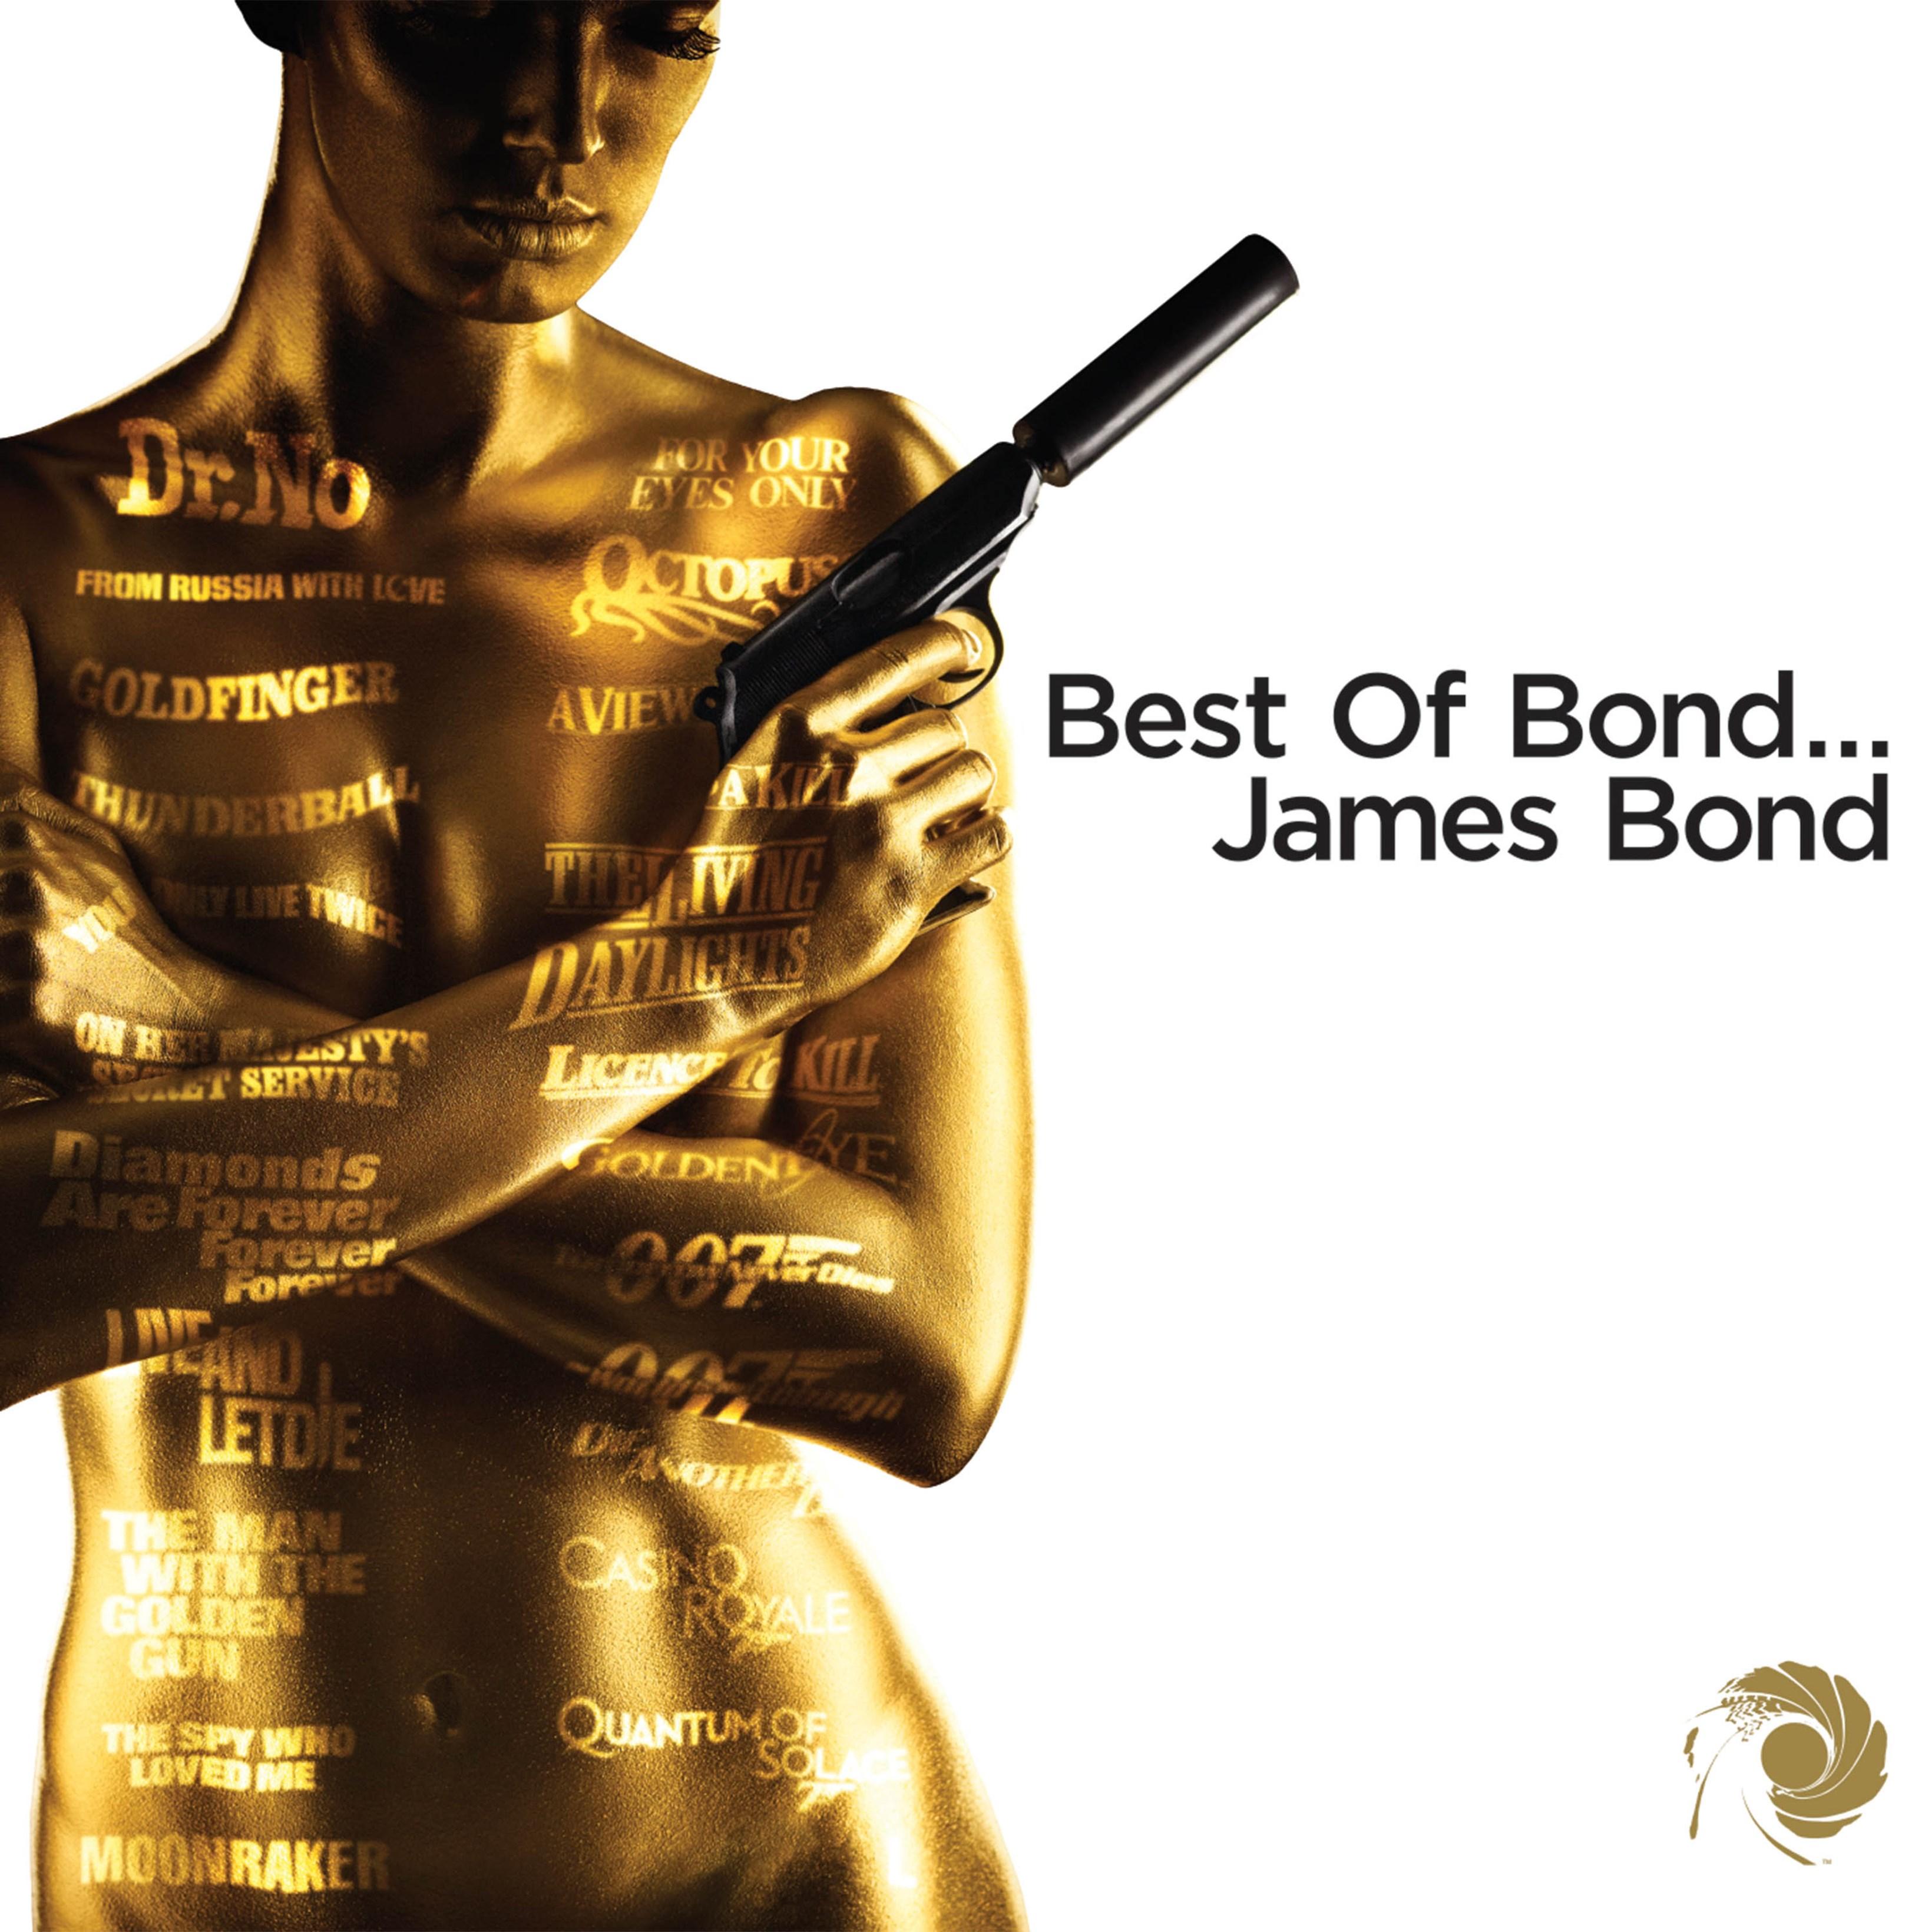 Best of Bond... James Bond - 1